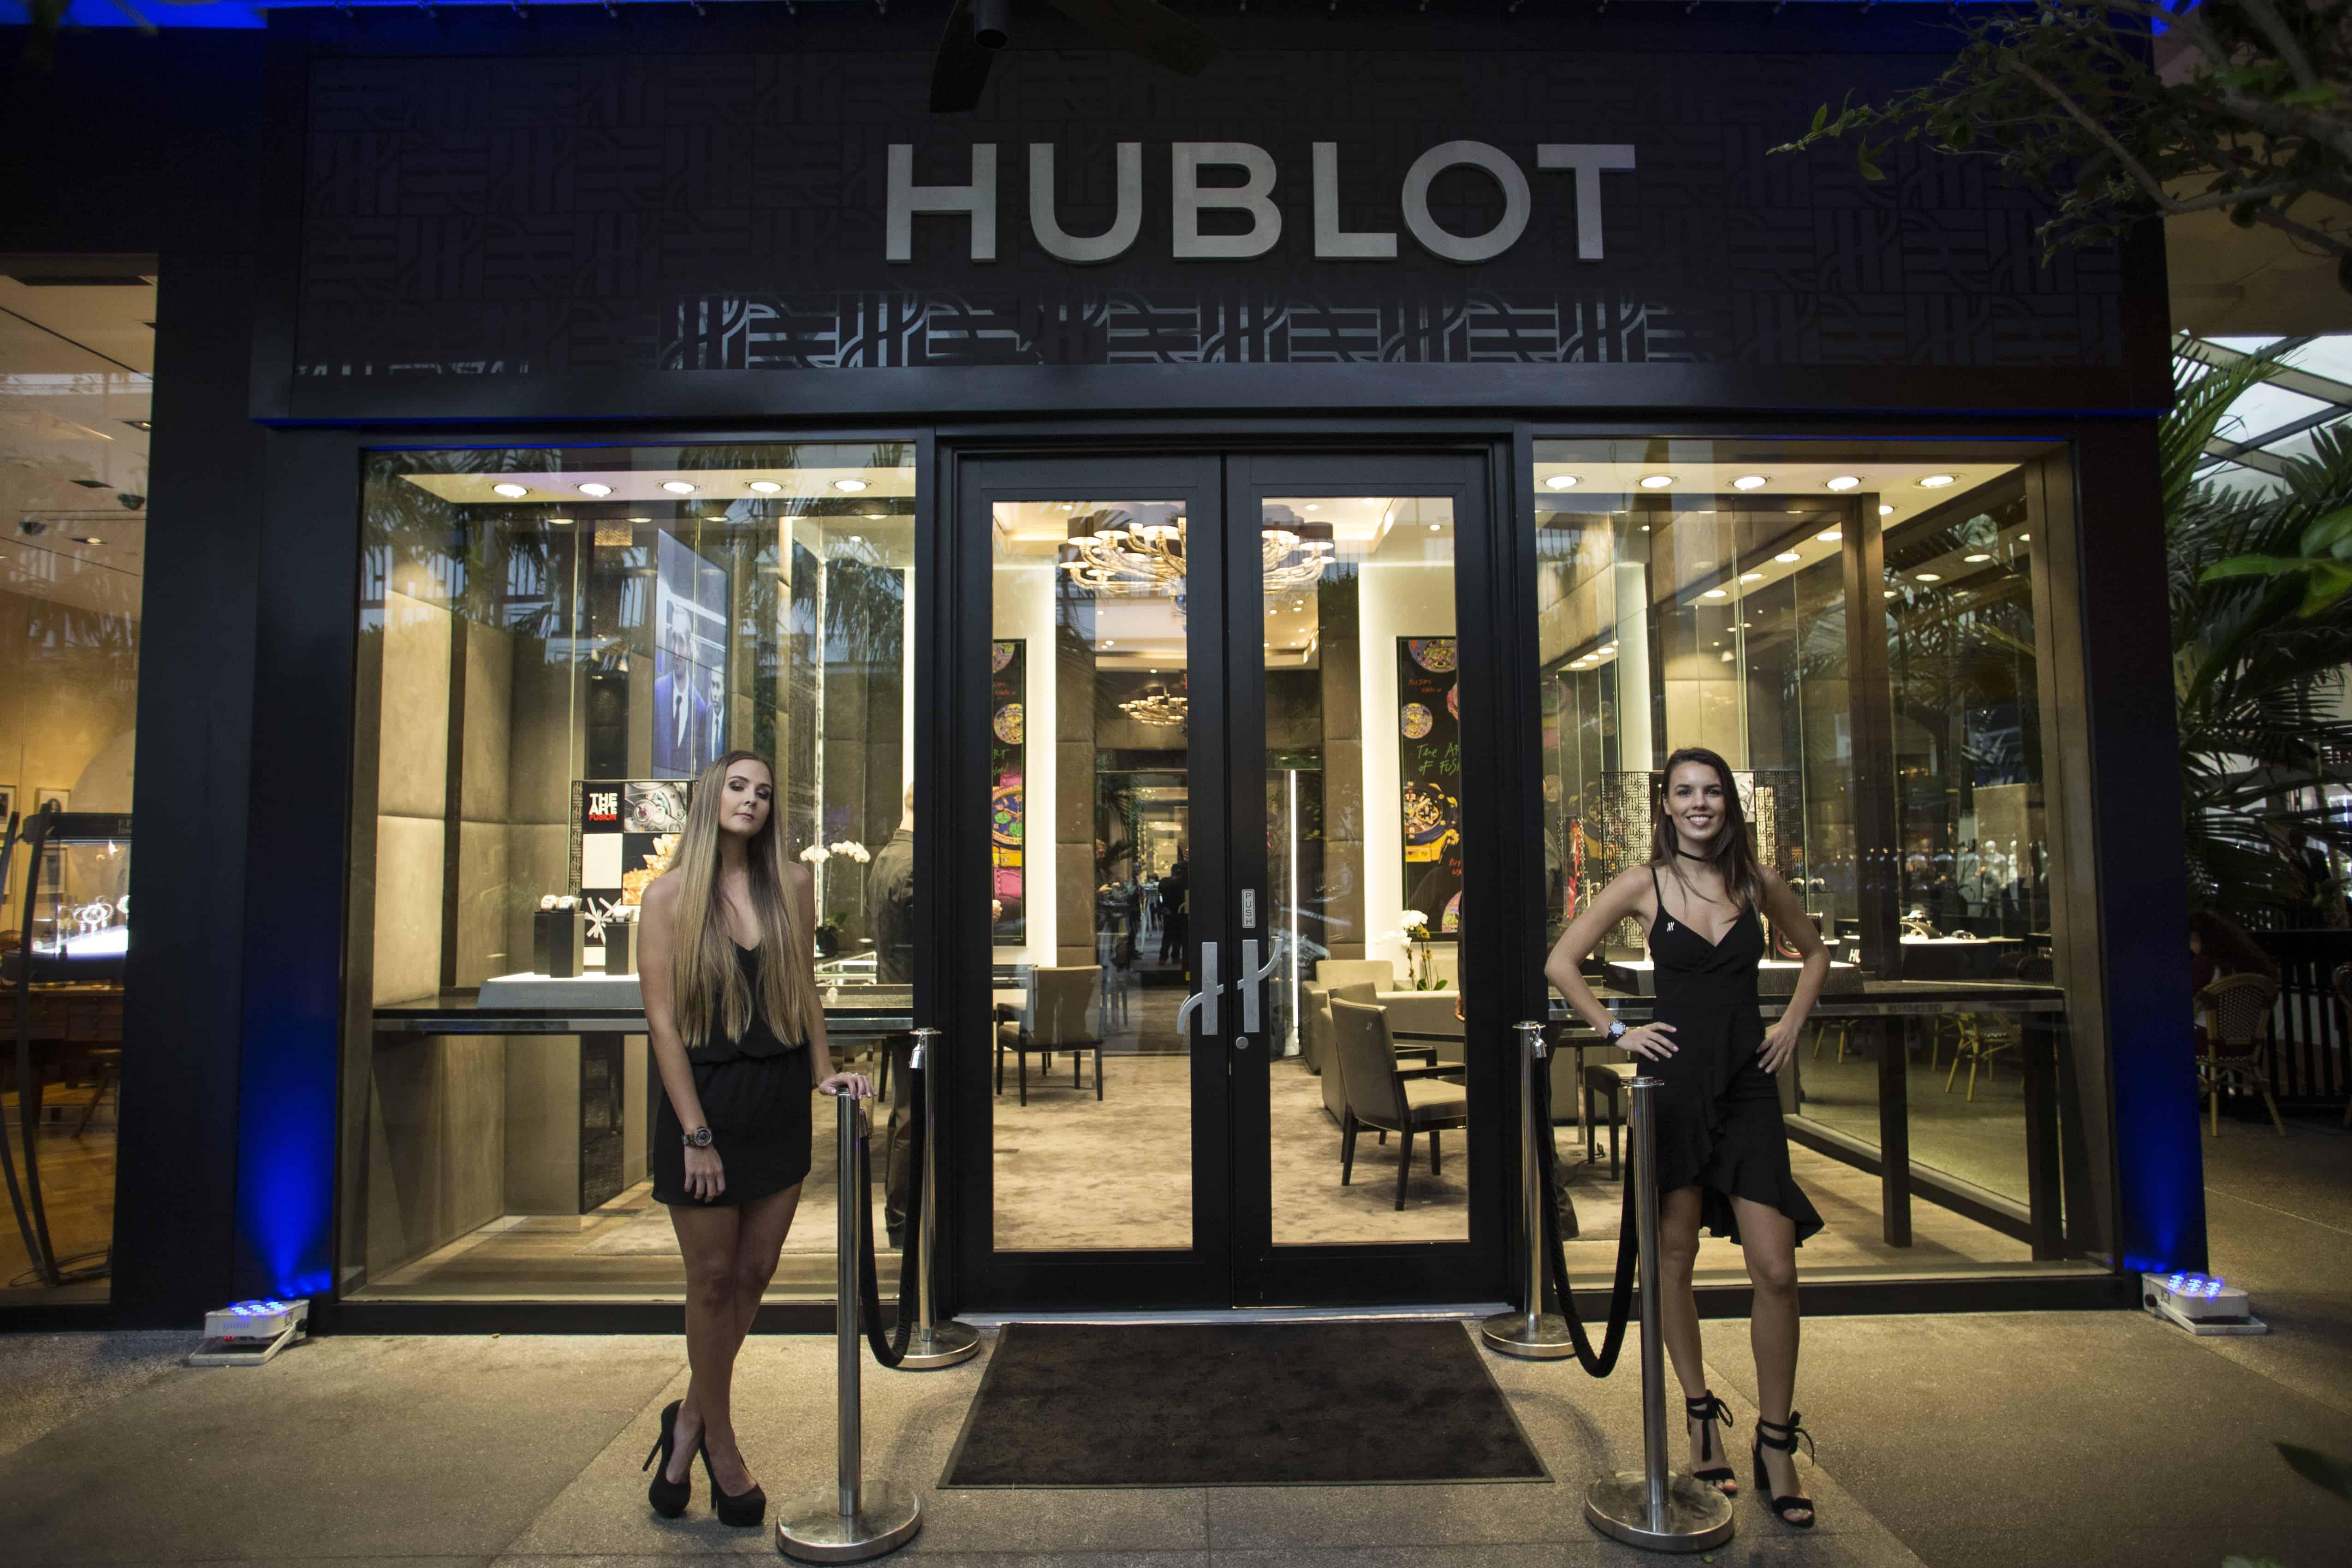 HublotBalHarbour - What happens when Hublot and Best Buddies team up? Just watch!